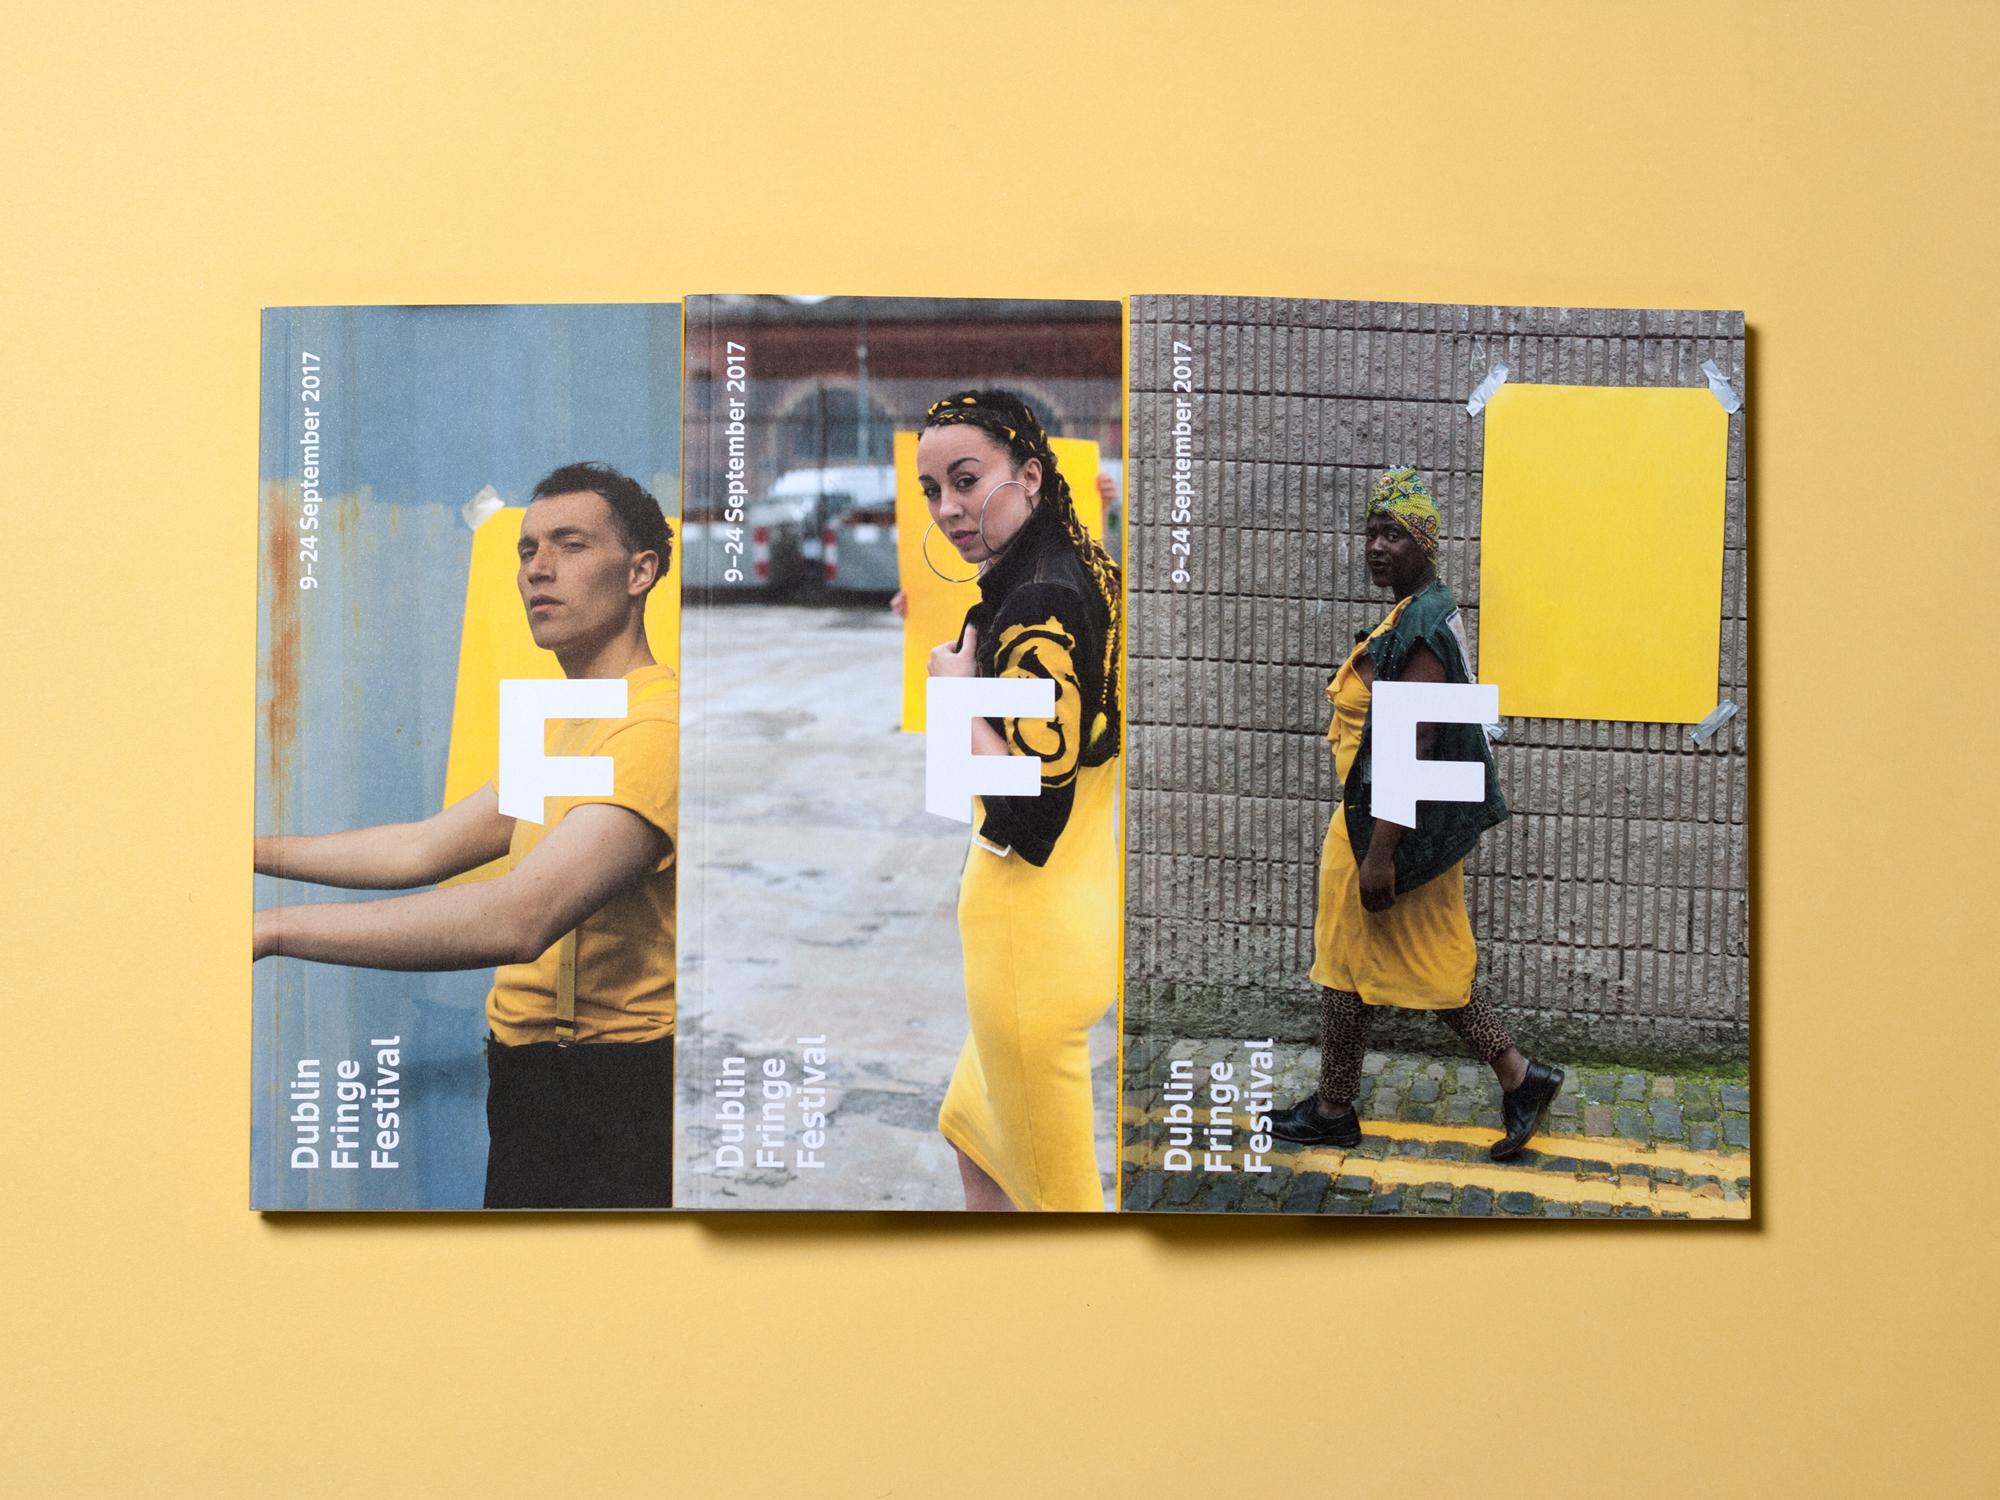 Cover image: Fringe17